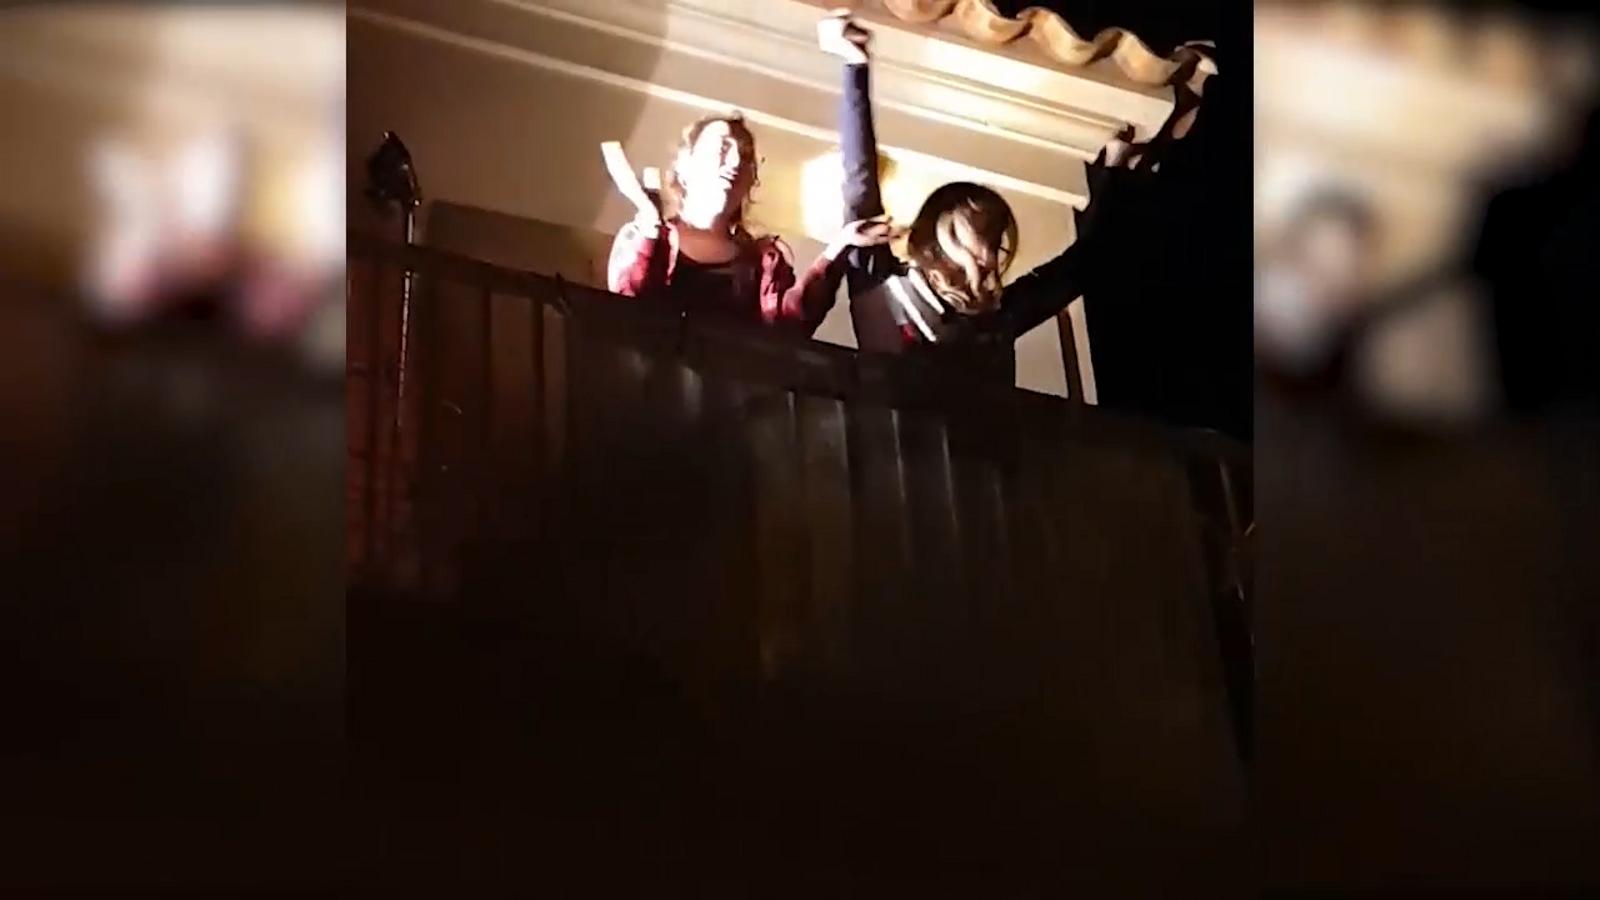 Els veïns de Cala Figuera canten cada horabaixa el 'Resistiré' del Dúo Dinàmico